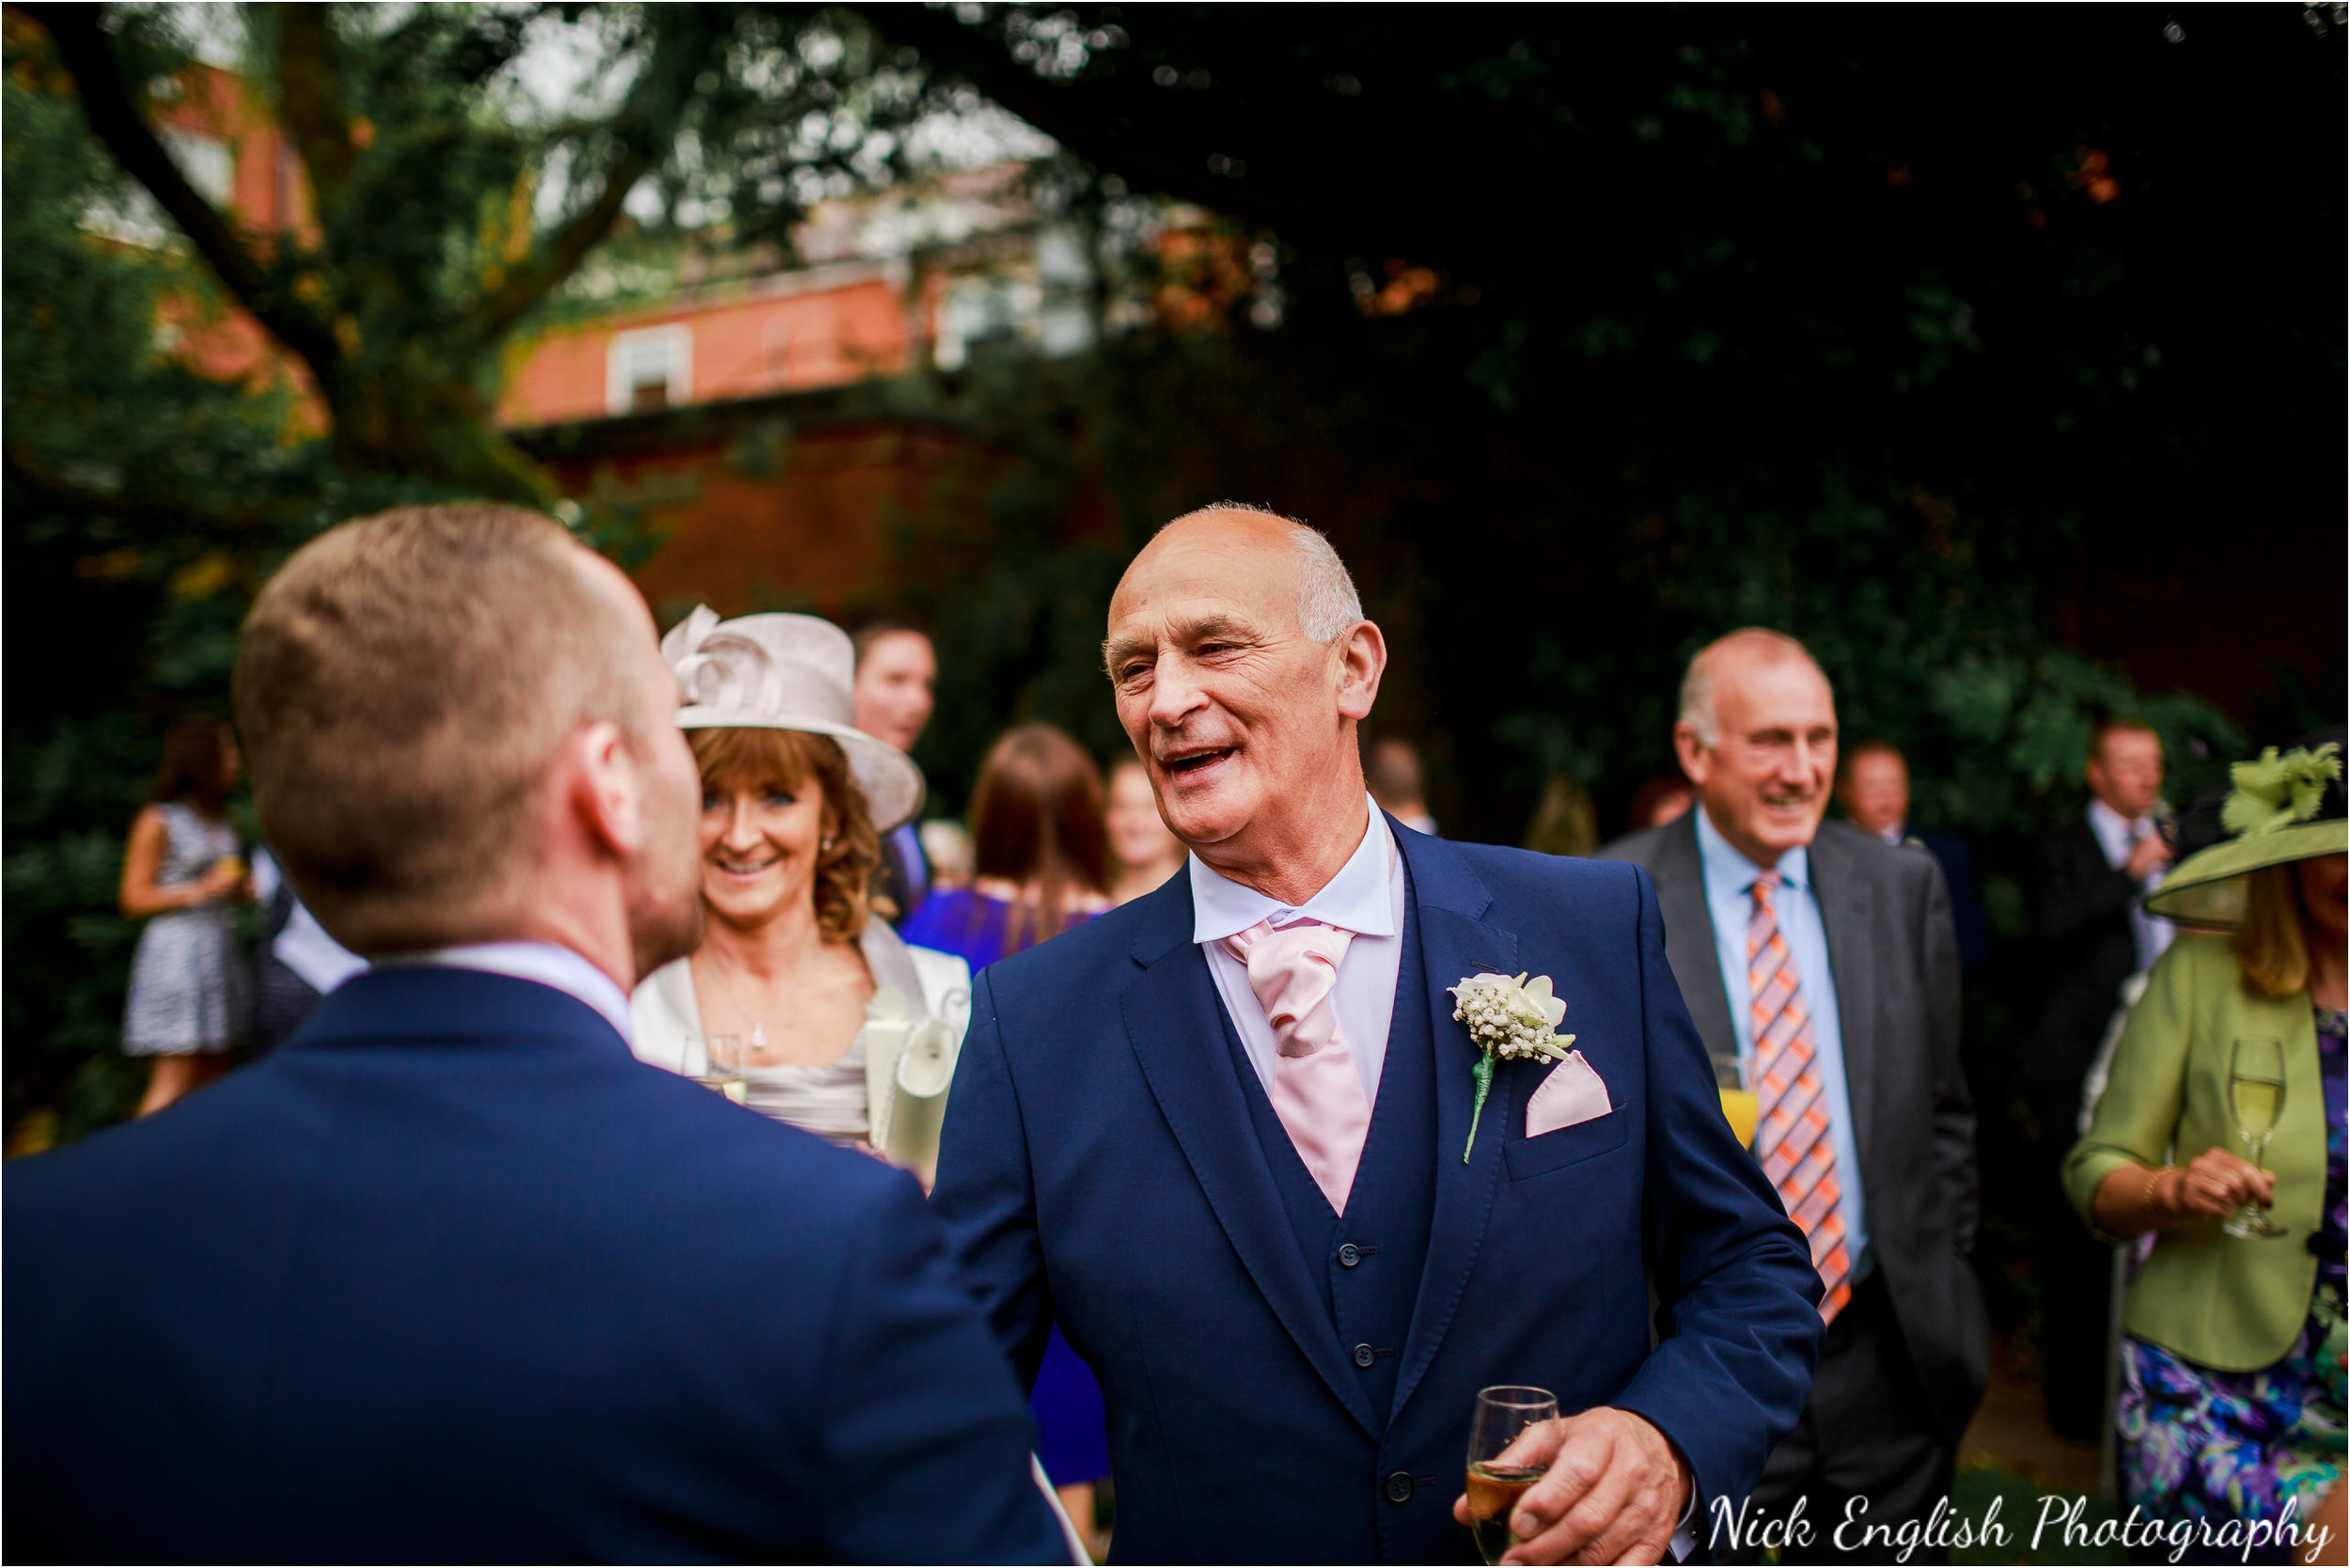 Emily David Wedding Photographs at Barton Grange Preston by Nick English Photography 98jpg.jpeg